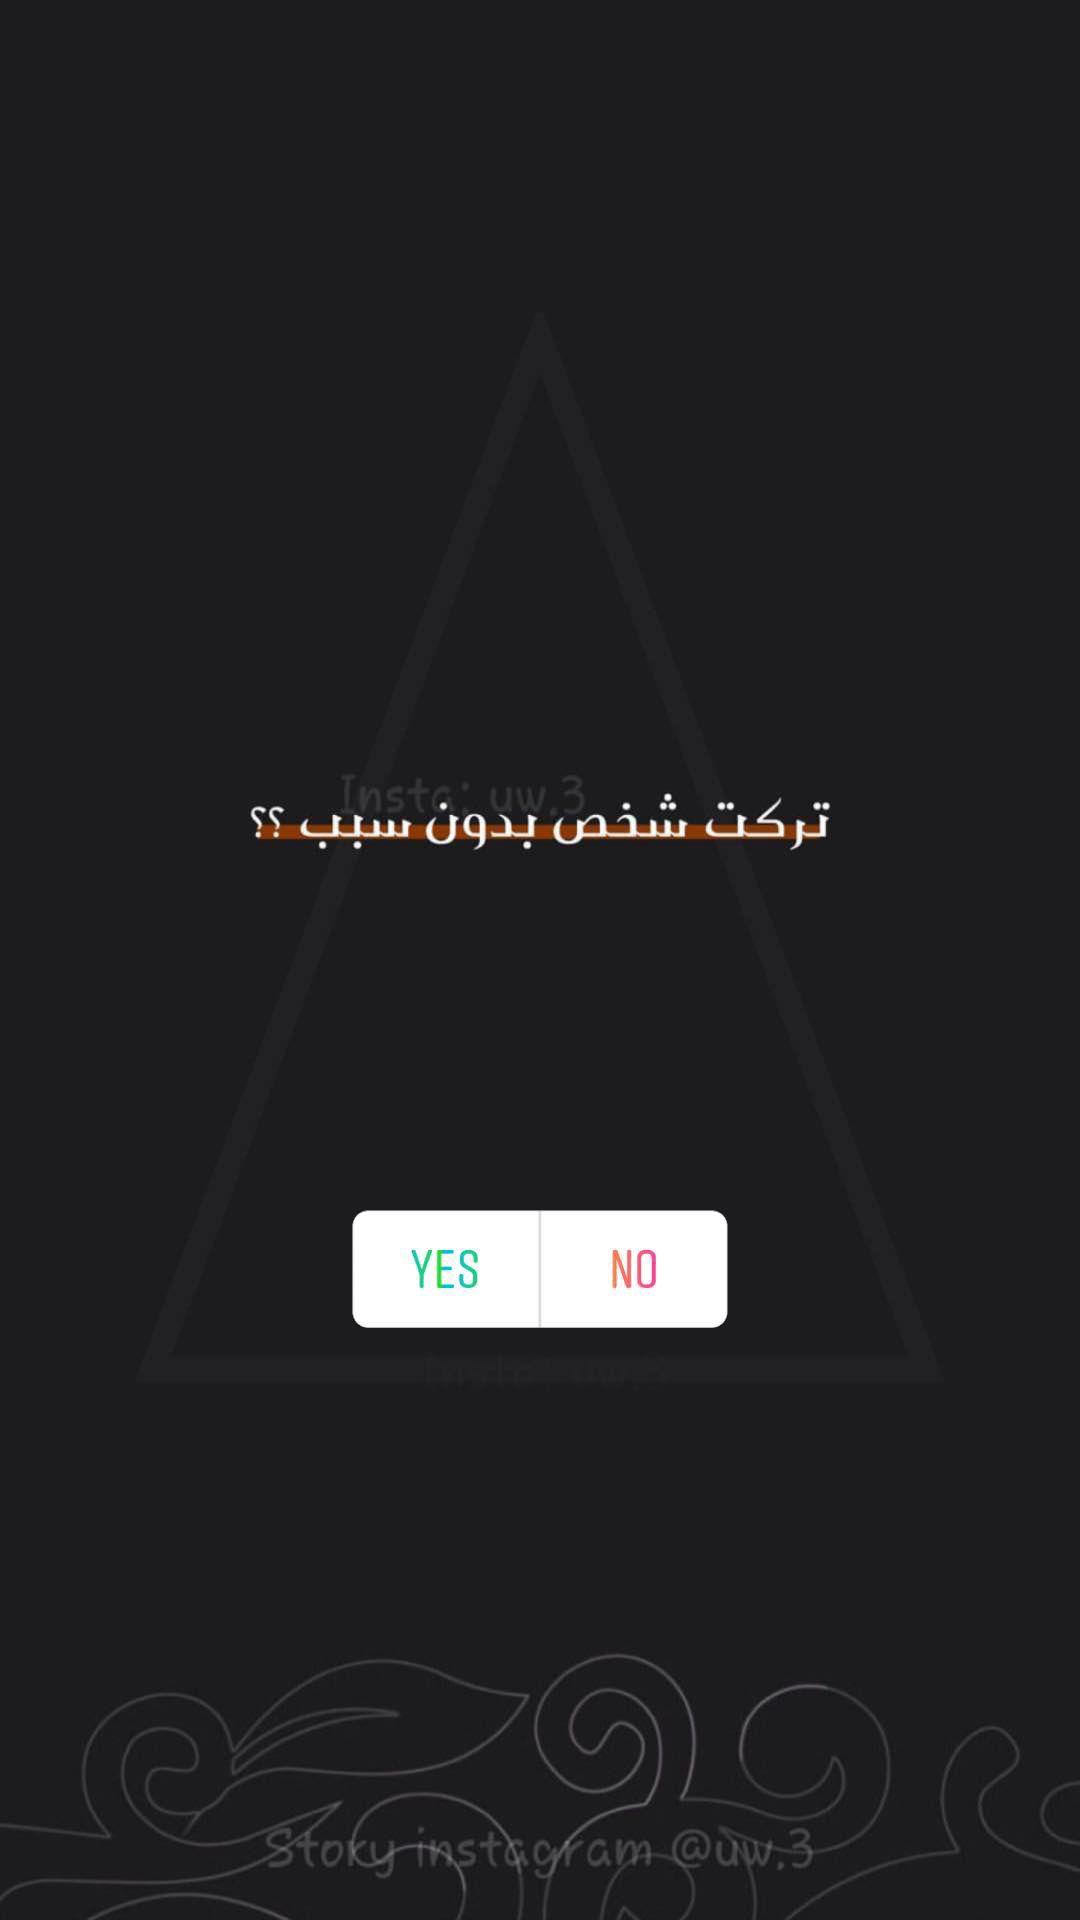 فعاليات ستوري Beautiful Arabic Words Instagram Captions Funny Arabic Quotes